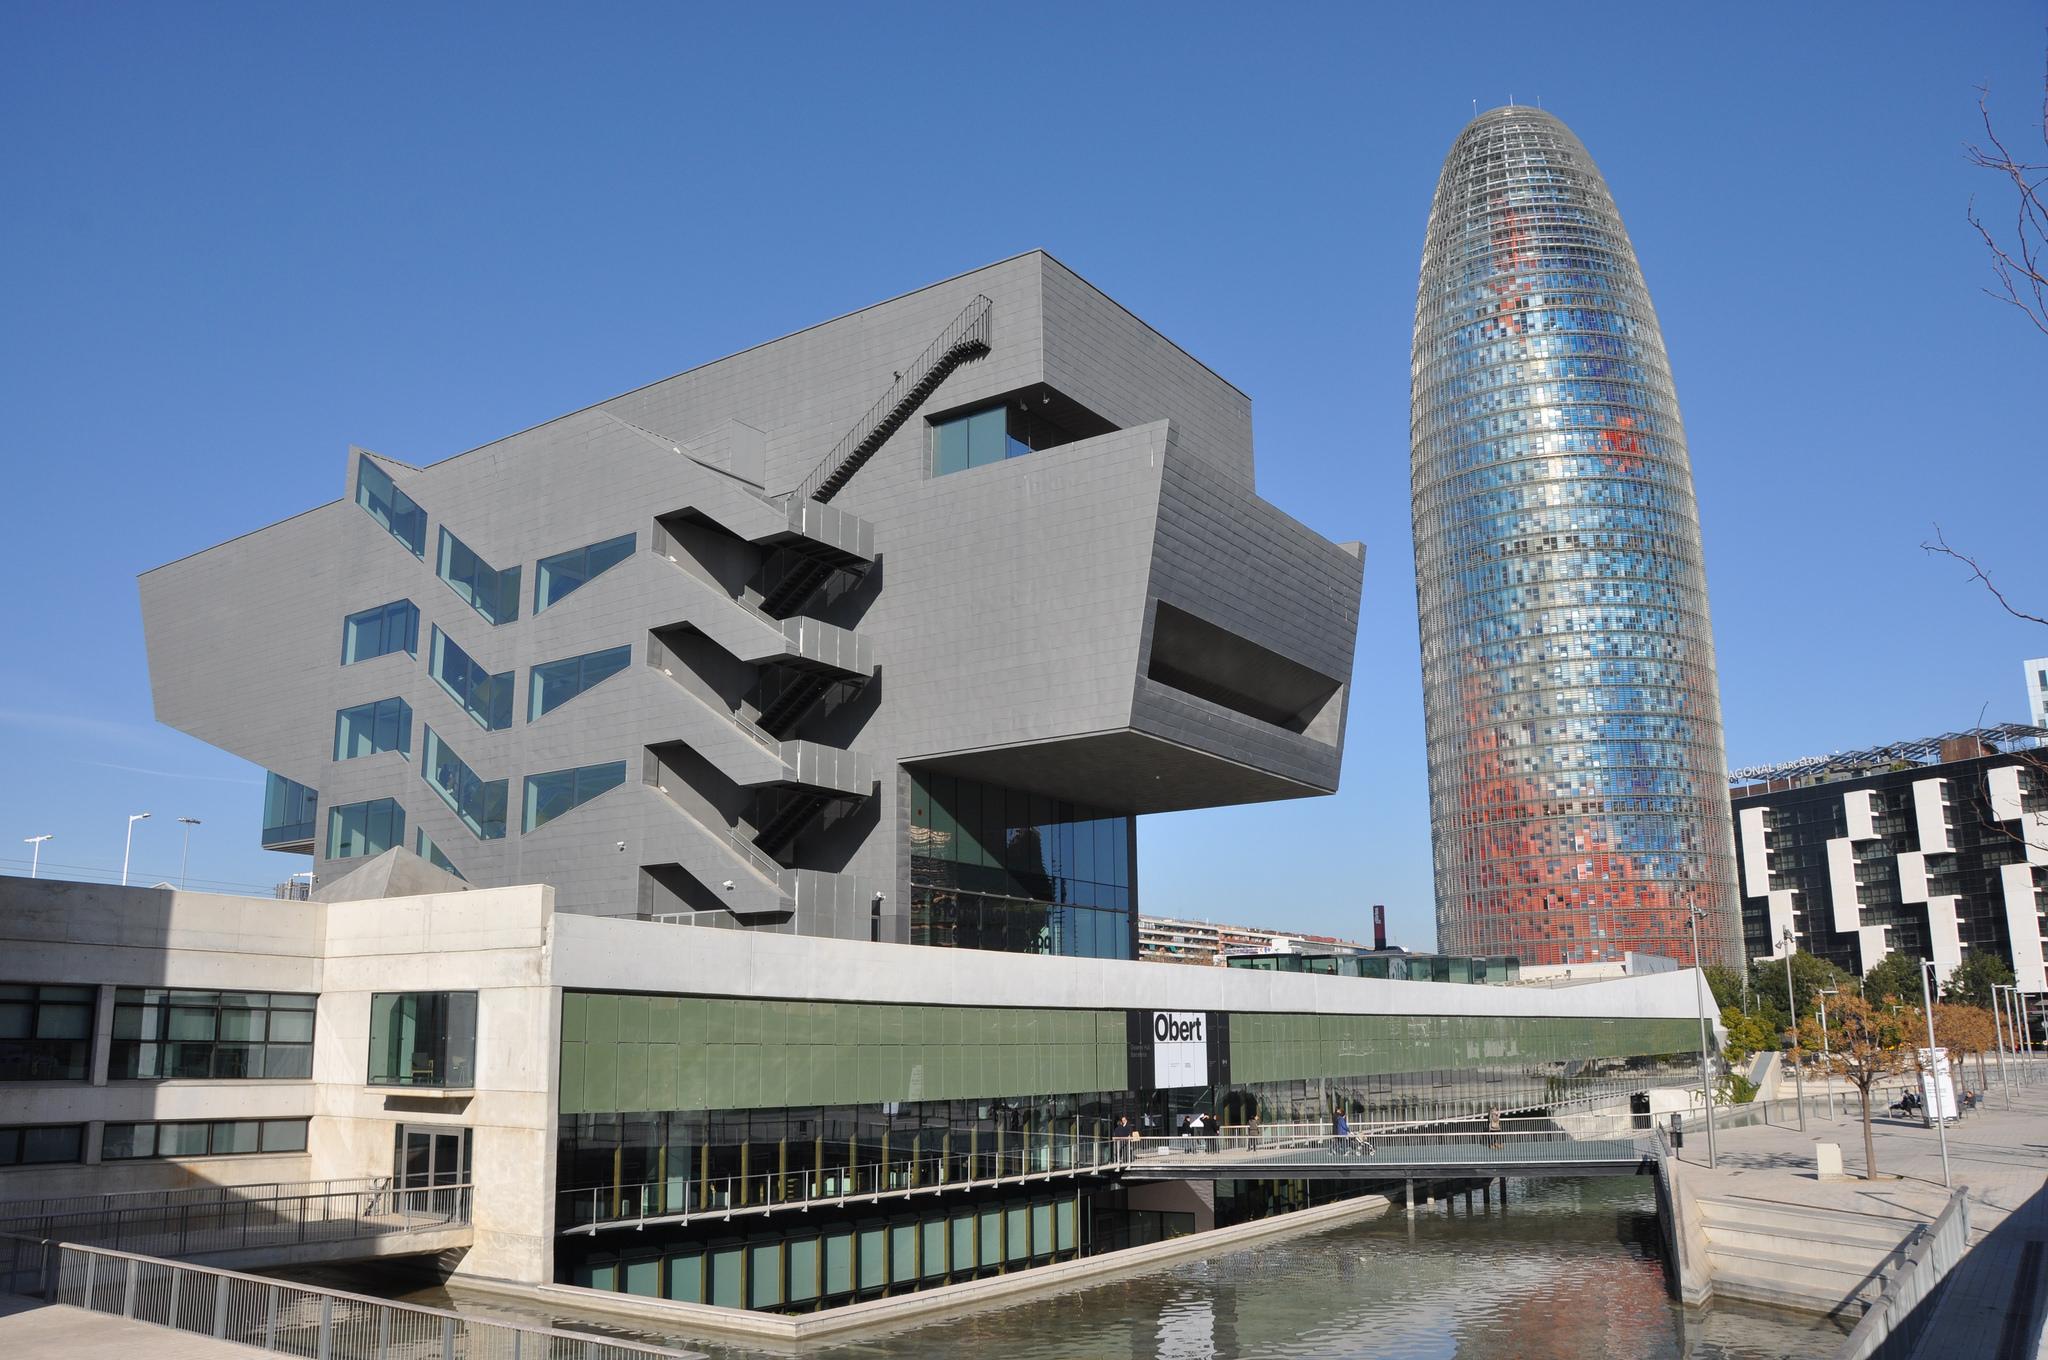 The Barcelona Design Museum © Josep Bracons